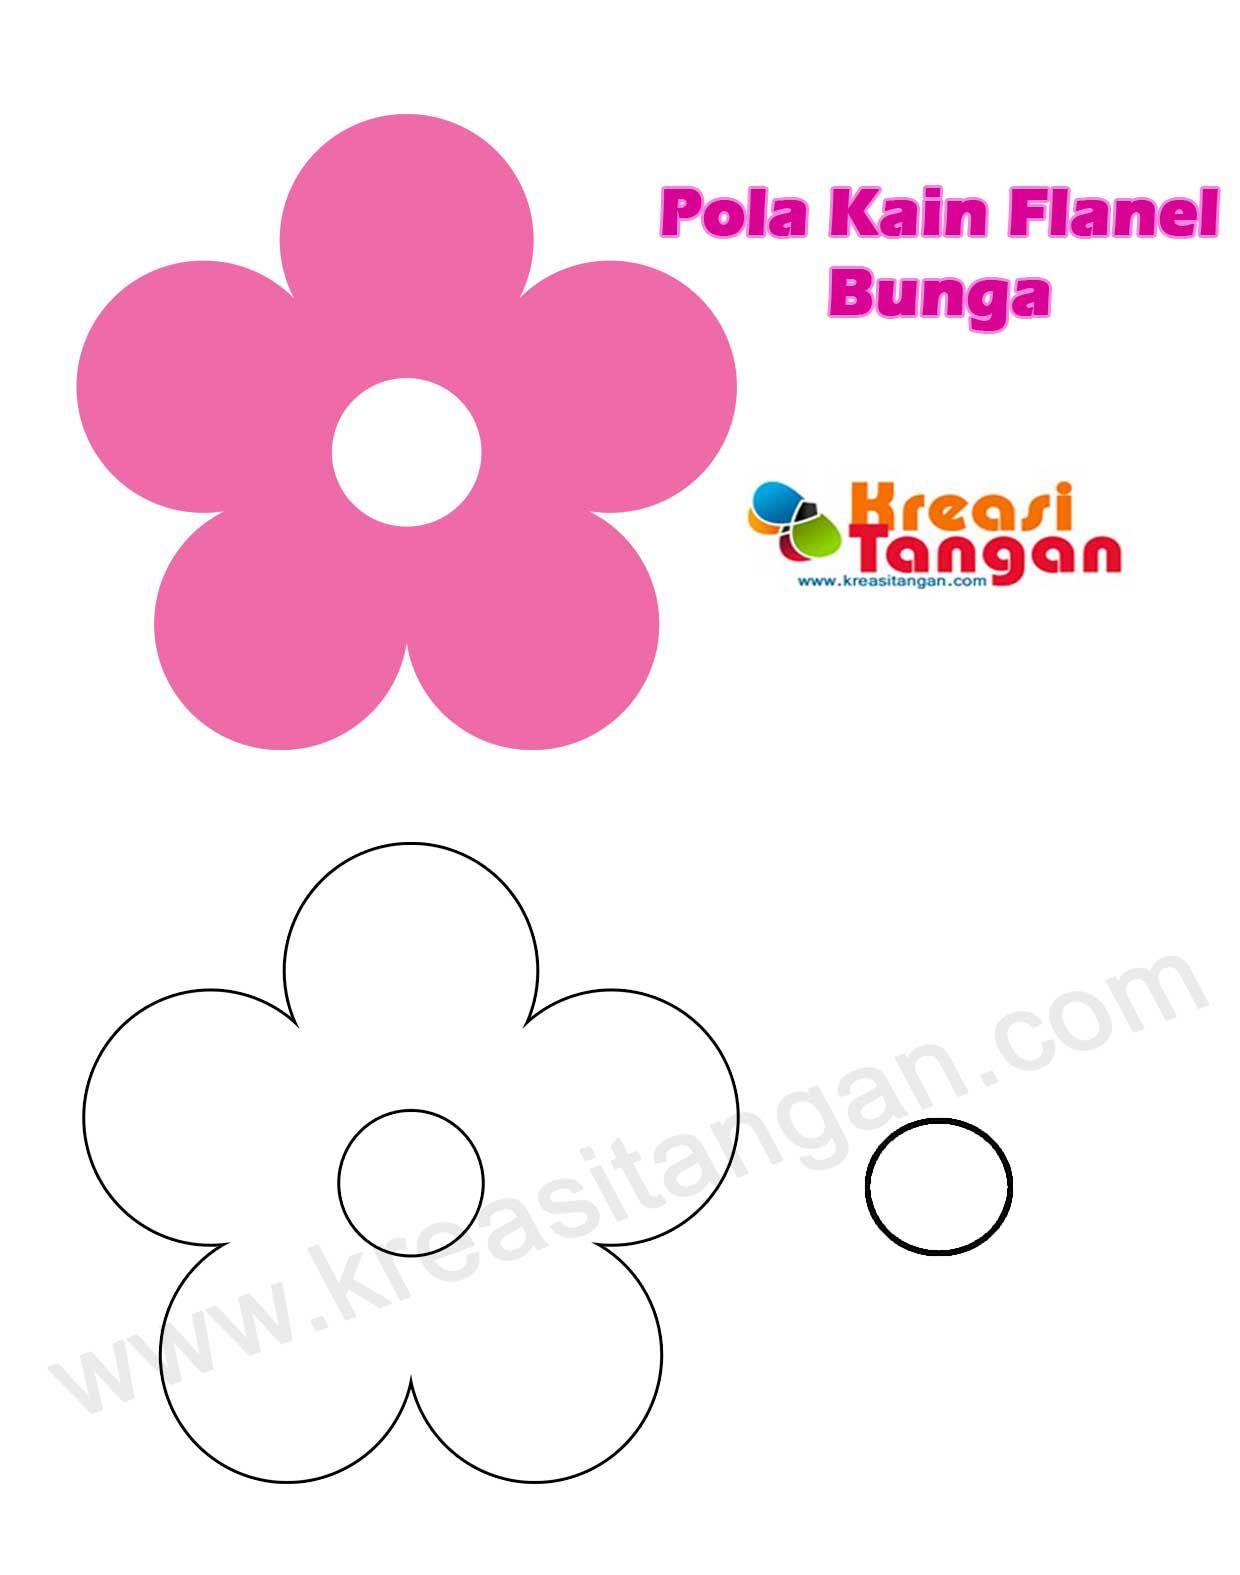 Pola Kain Flanel Bunga Bunga 3 Pinterest Felt Patterns Crafts